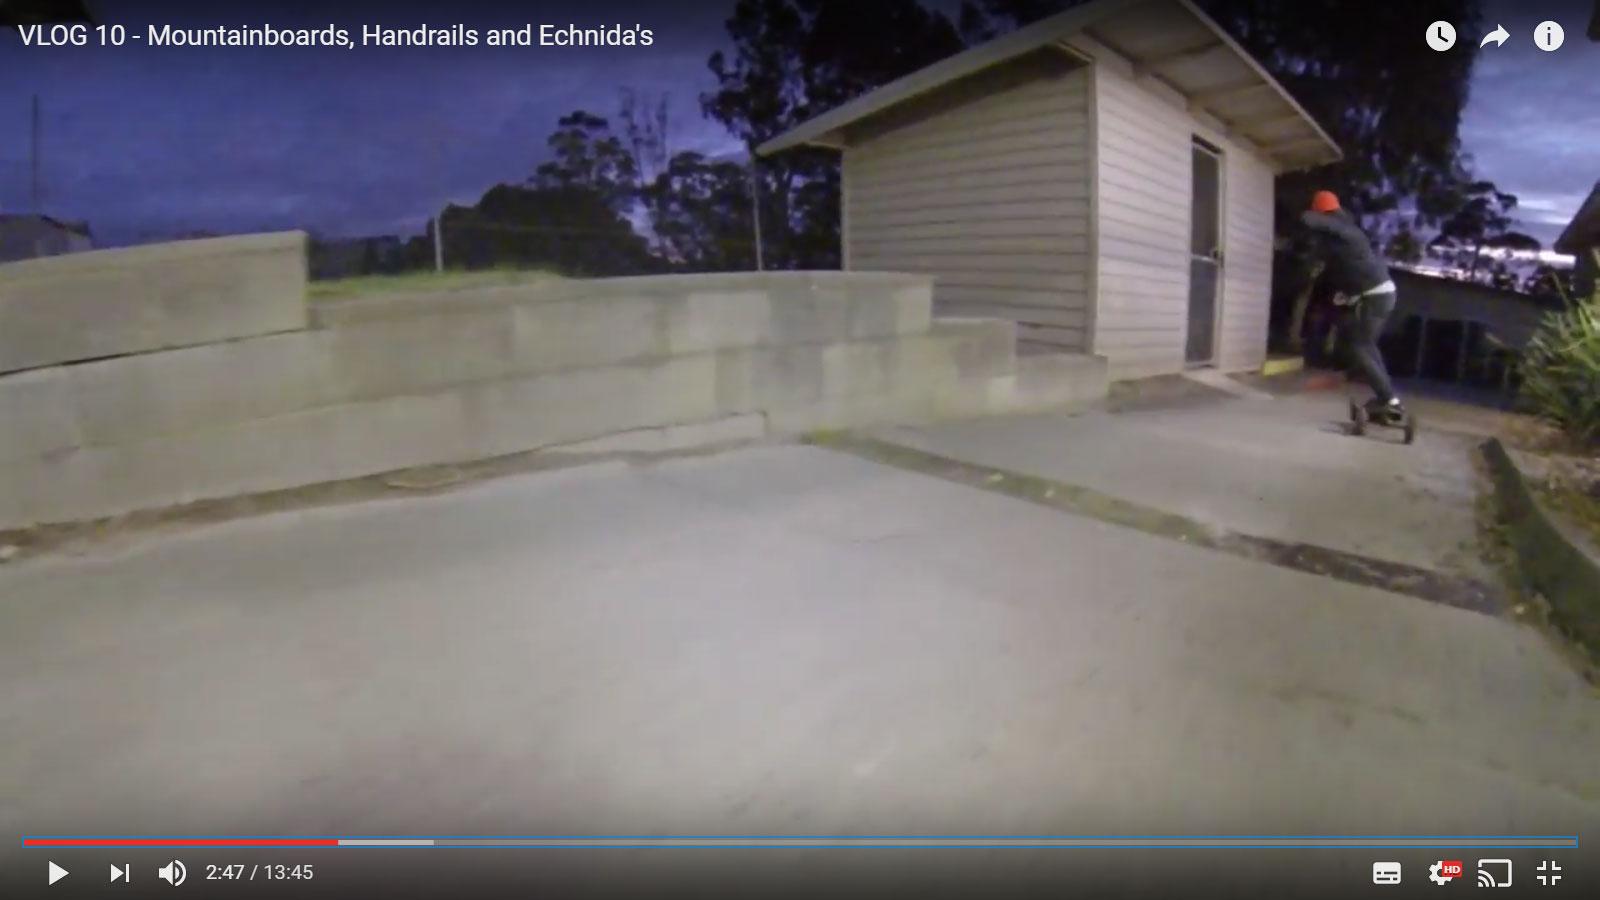 Dylan Warren Vlog 10 – Mountainboards, Handrails and Echnida's